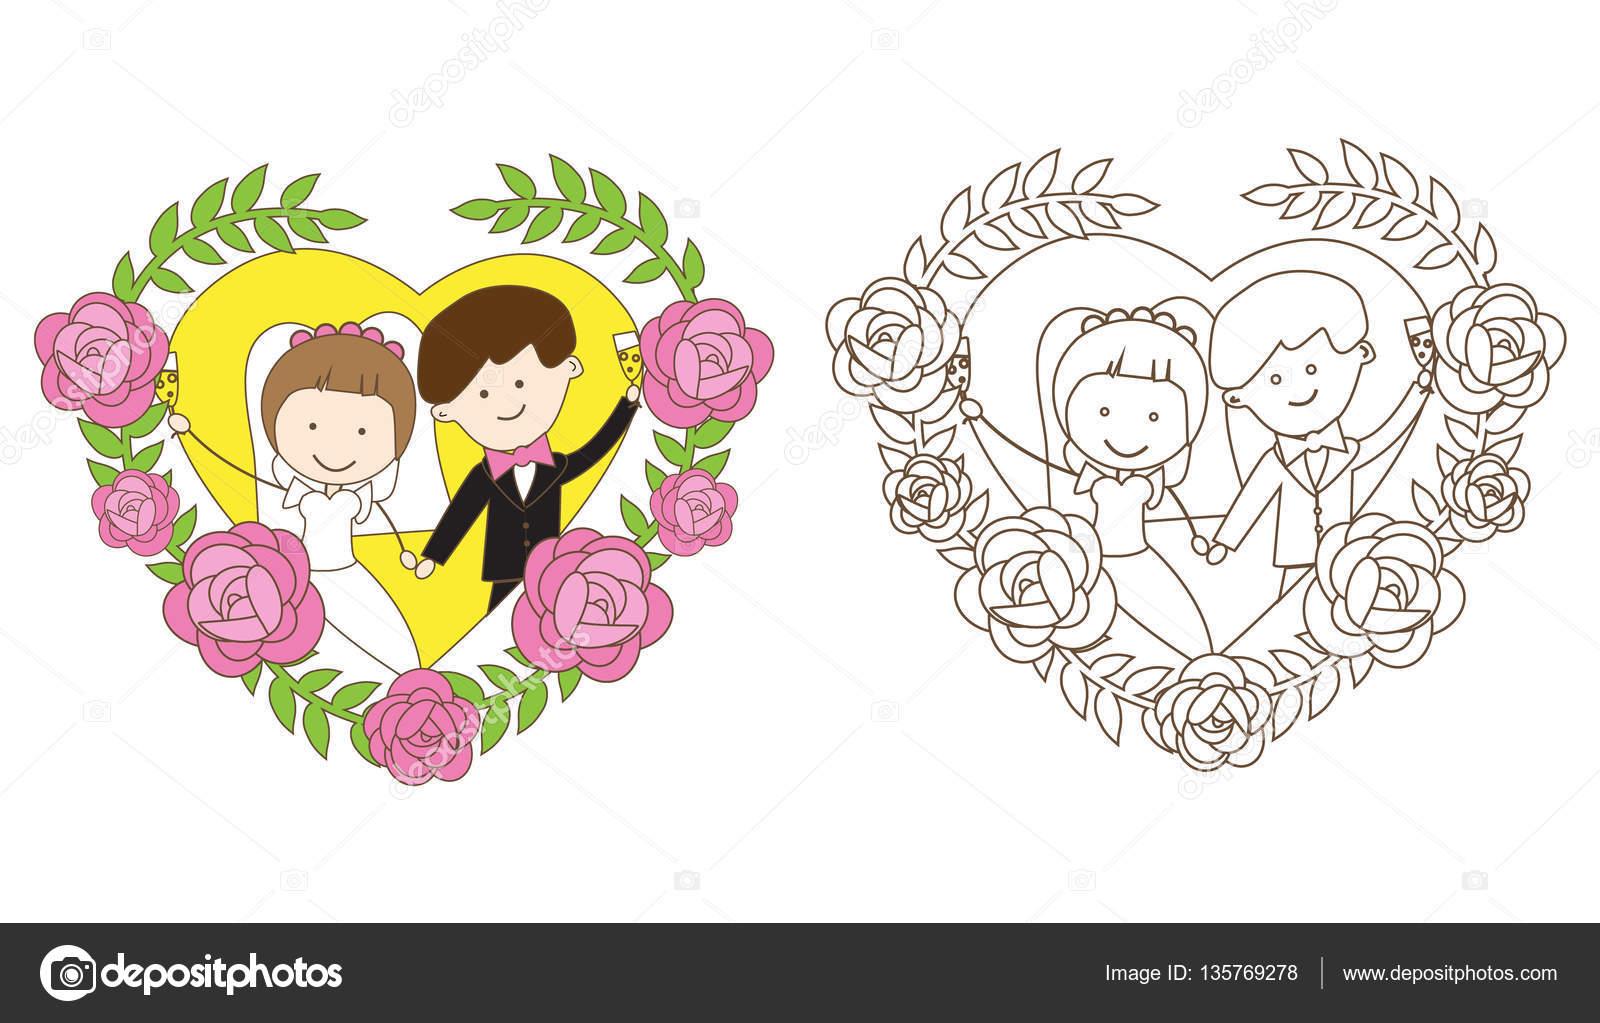 Malvorlagen Hochzeit — Stockvektor © alenaspl #135769278